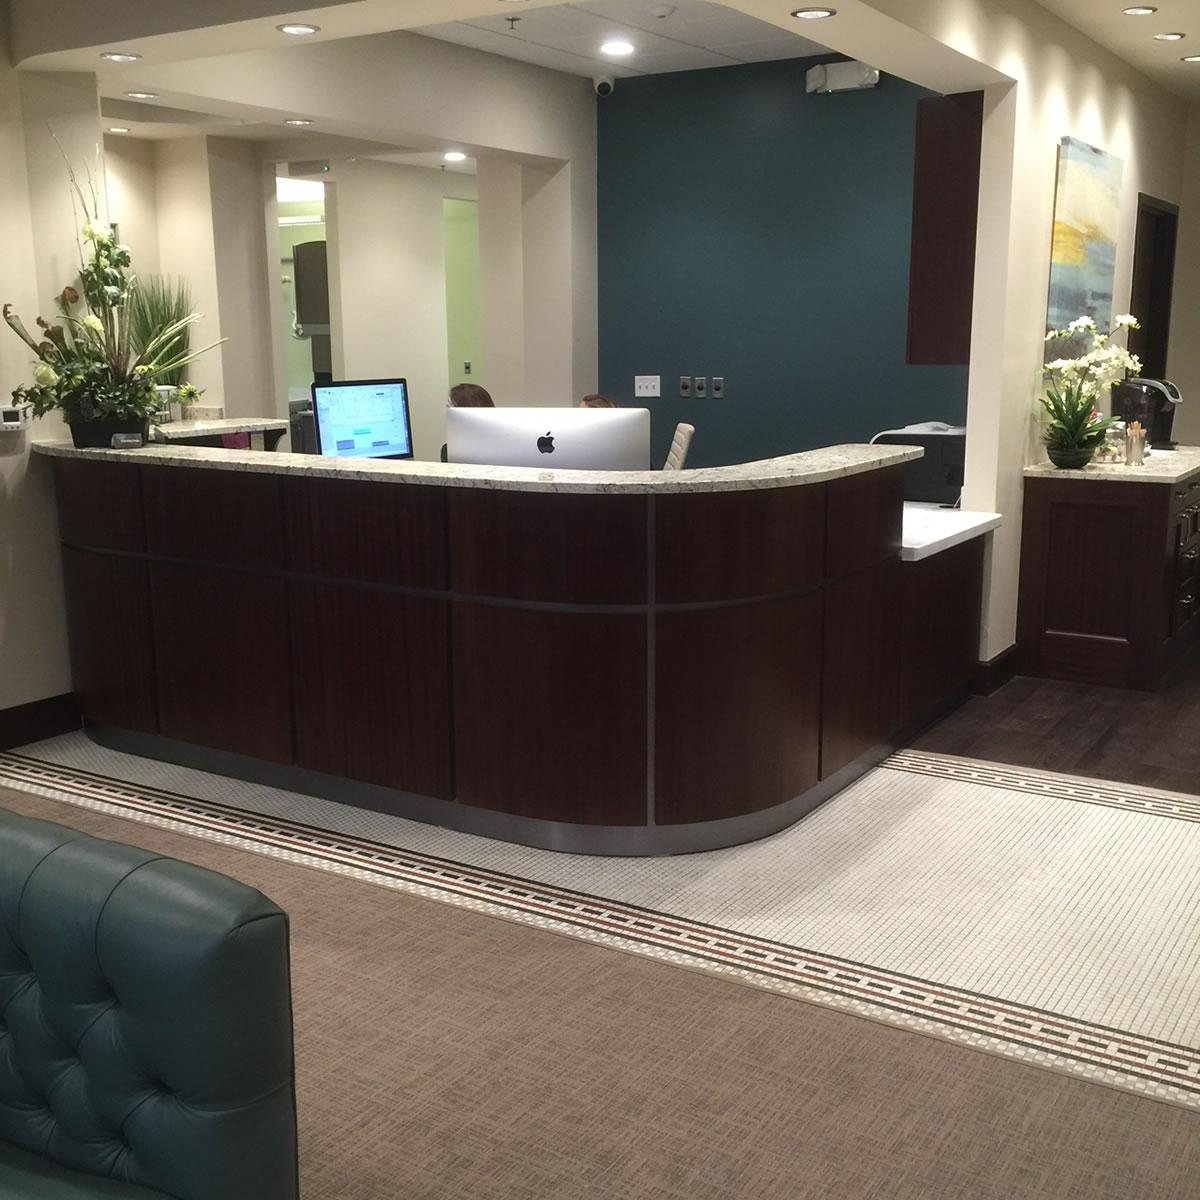 dentist office design. Dental-office-design-3660 Dentist Office Design